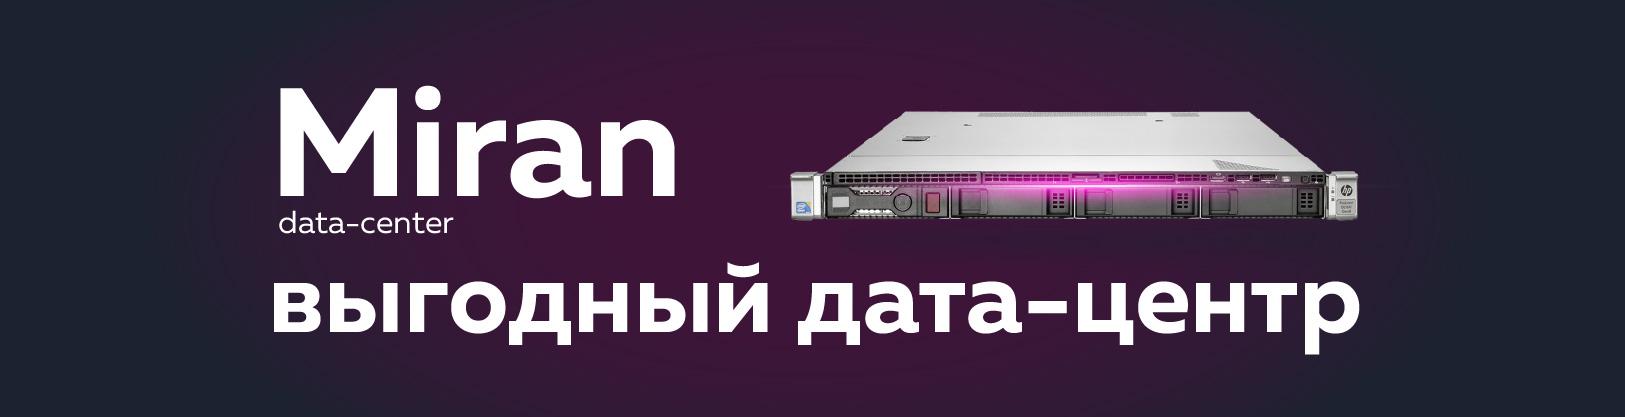 Jitsi Meet: опенсорсная альтернатива «шпионскому» видеоприложению Zoom - 7